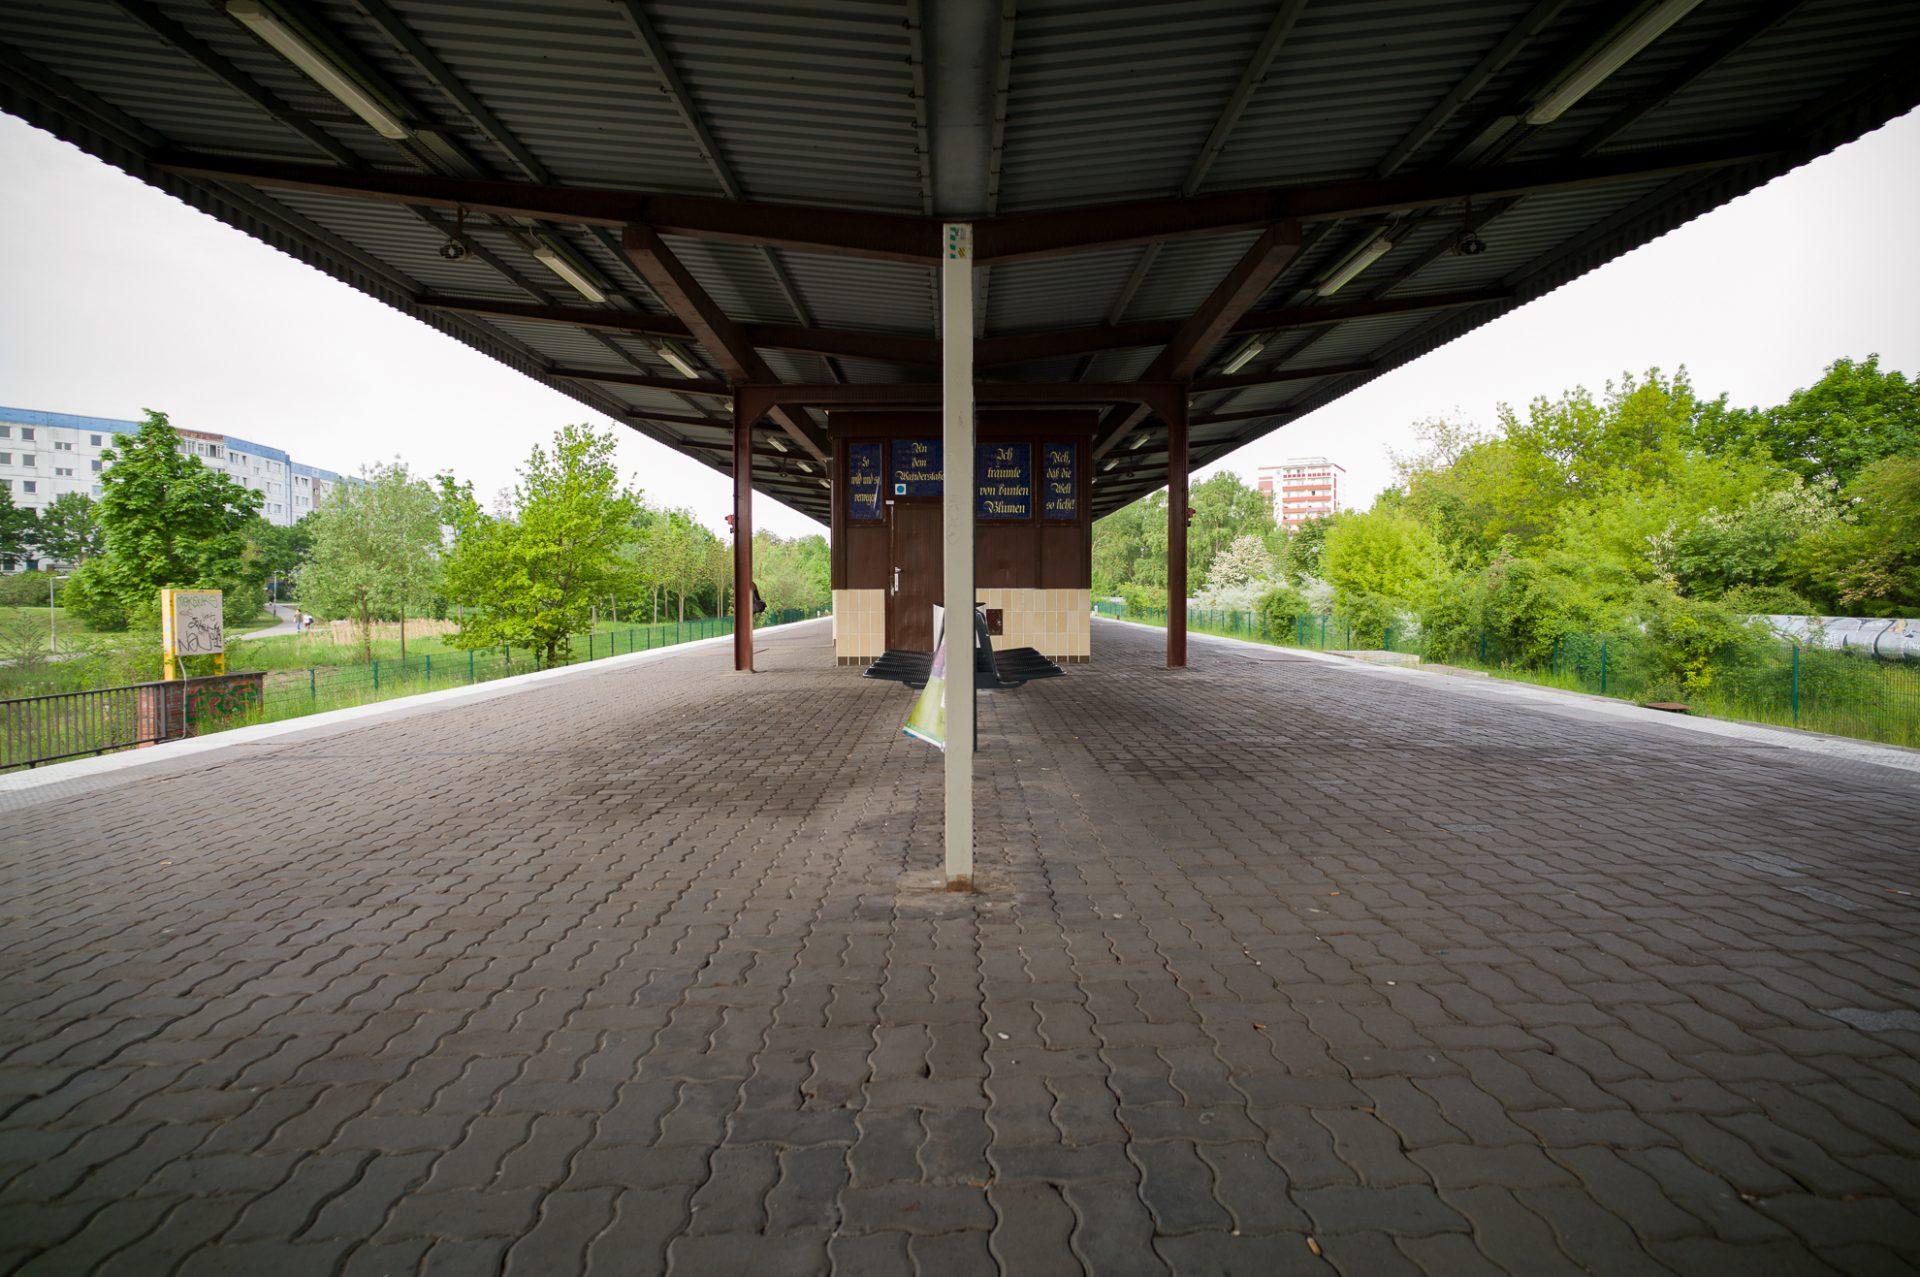 Cottbusser Platz